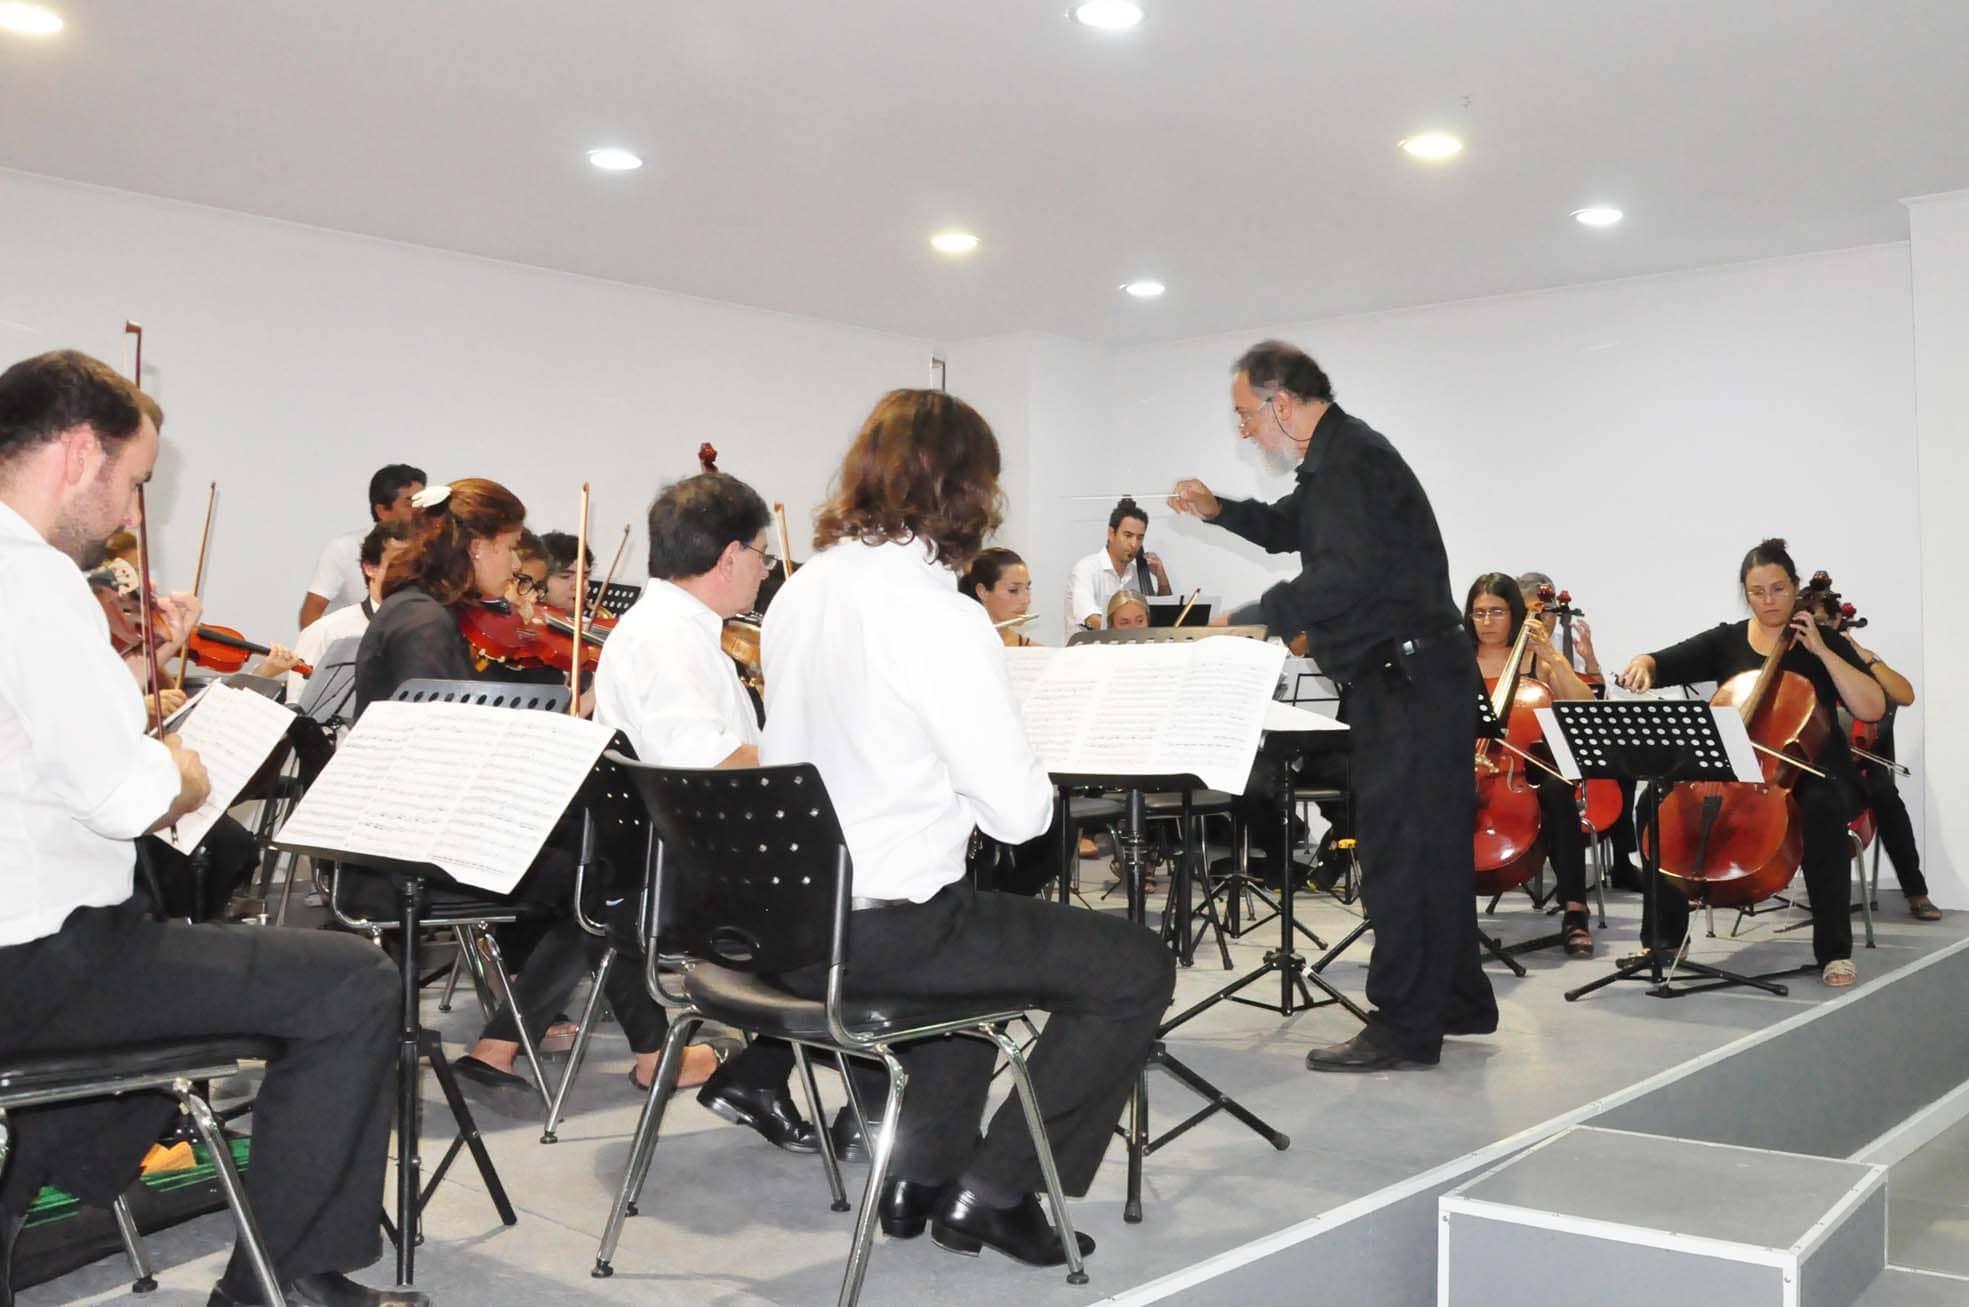 Homenaje a Barracchia escuela de música - enero 2016 (17)